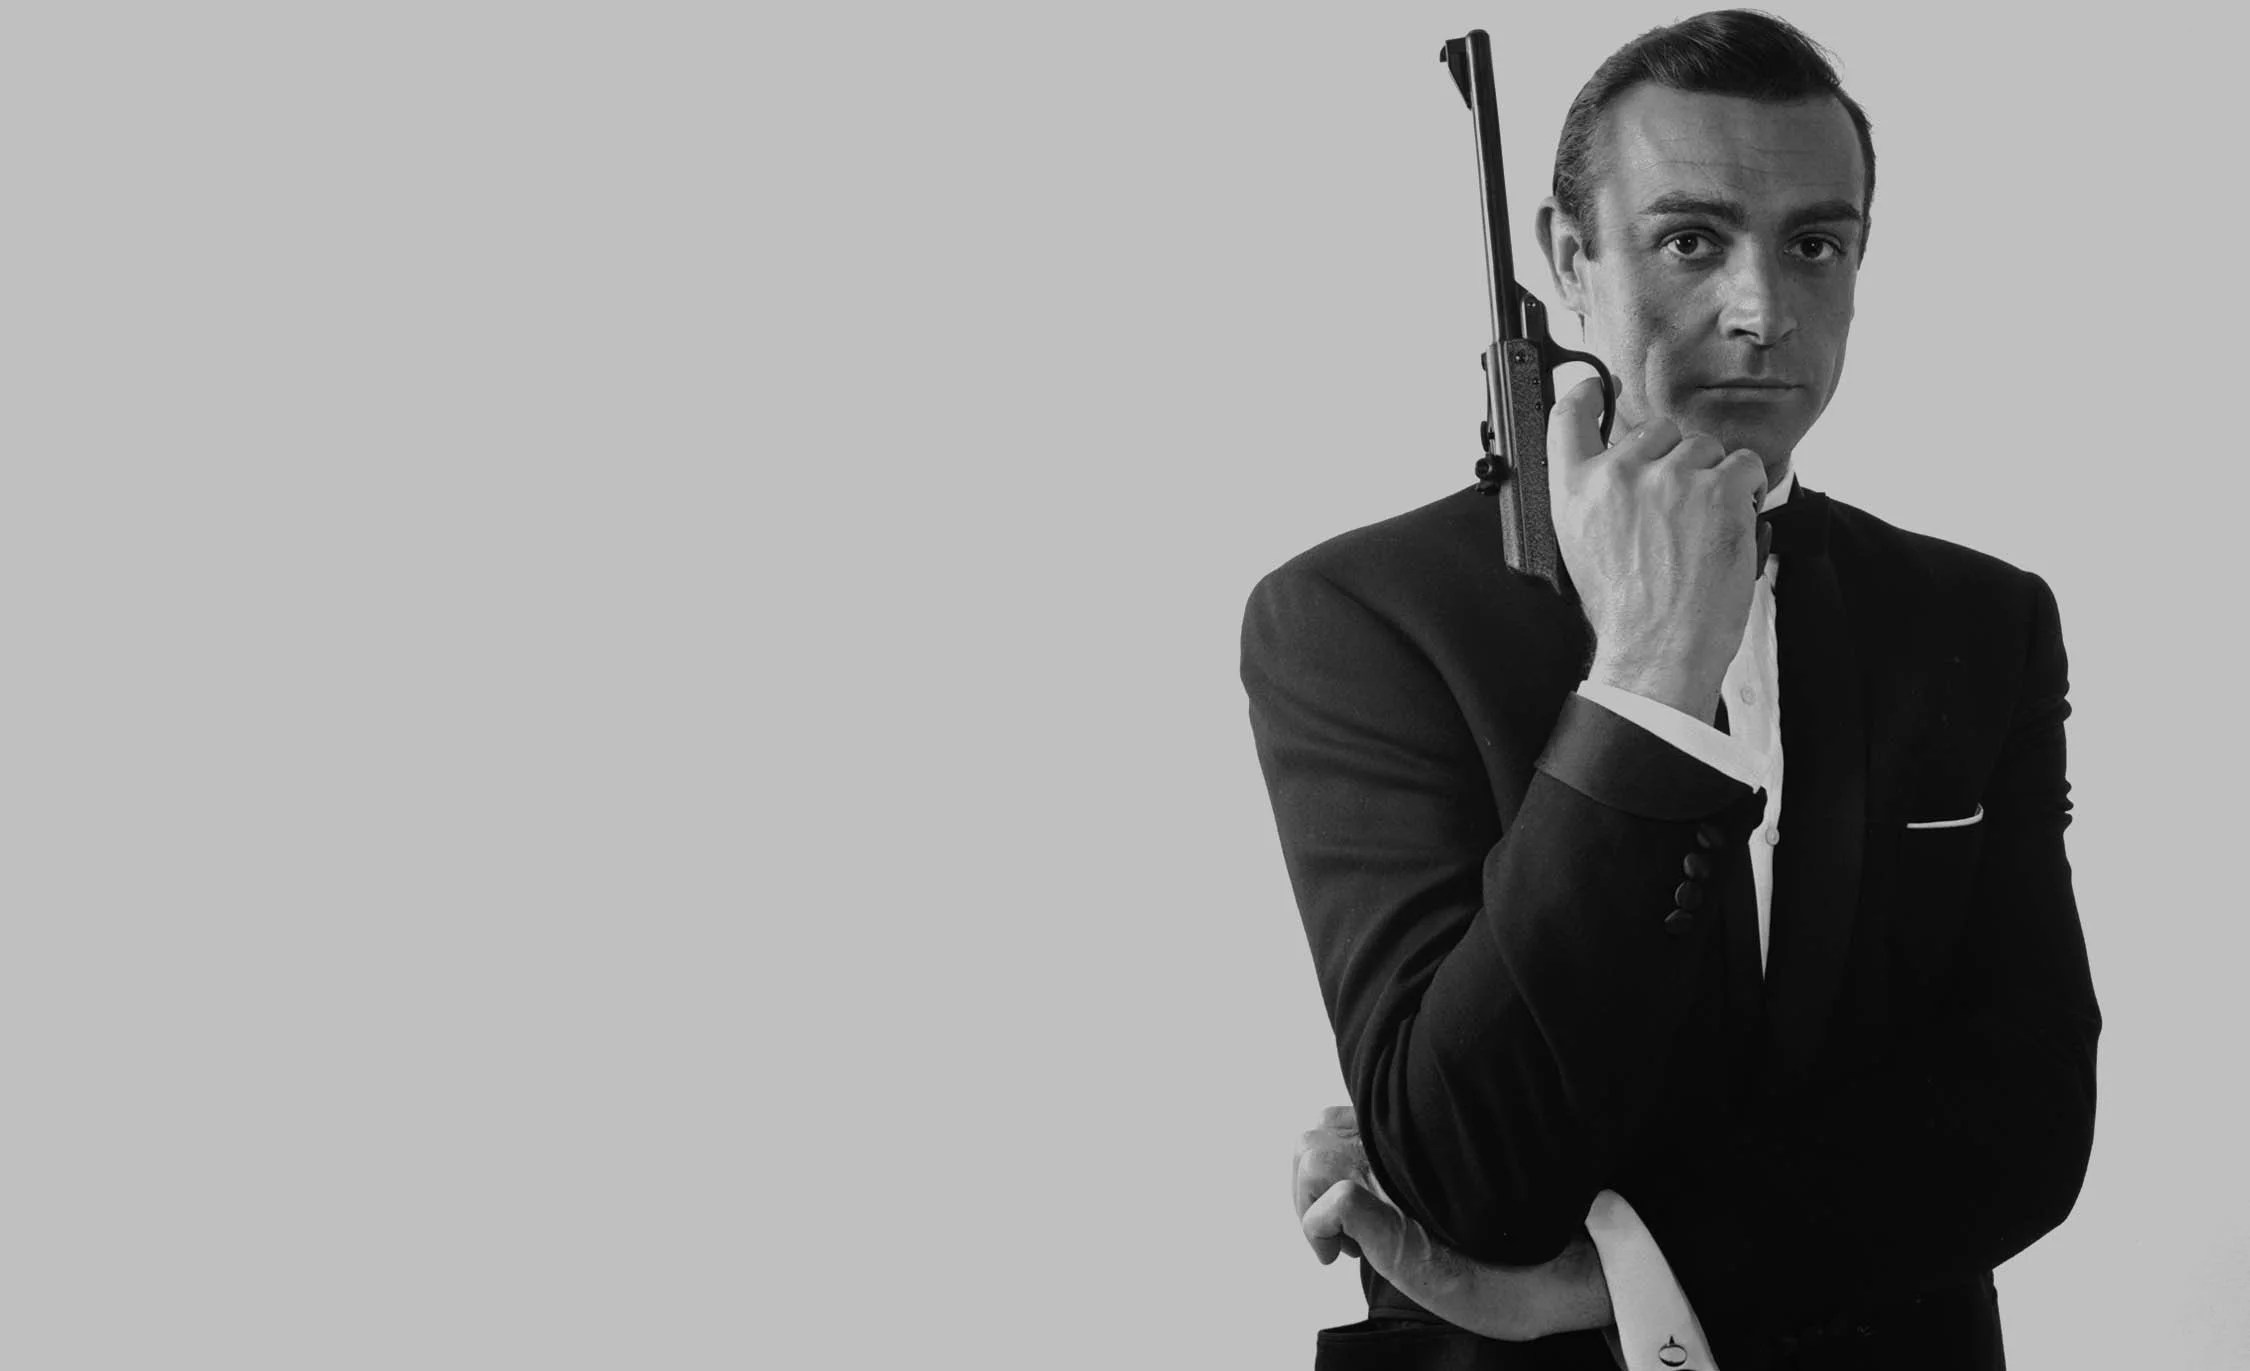 https://i1.wp.com/www.007.com/wp-content/uploads/2014/01/Sean-Connery-james-bond-BW.jpg